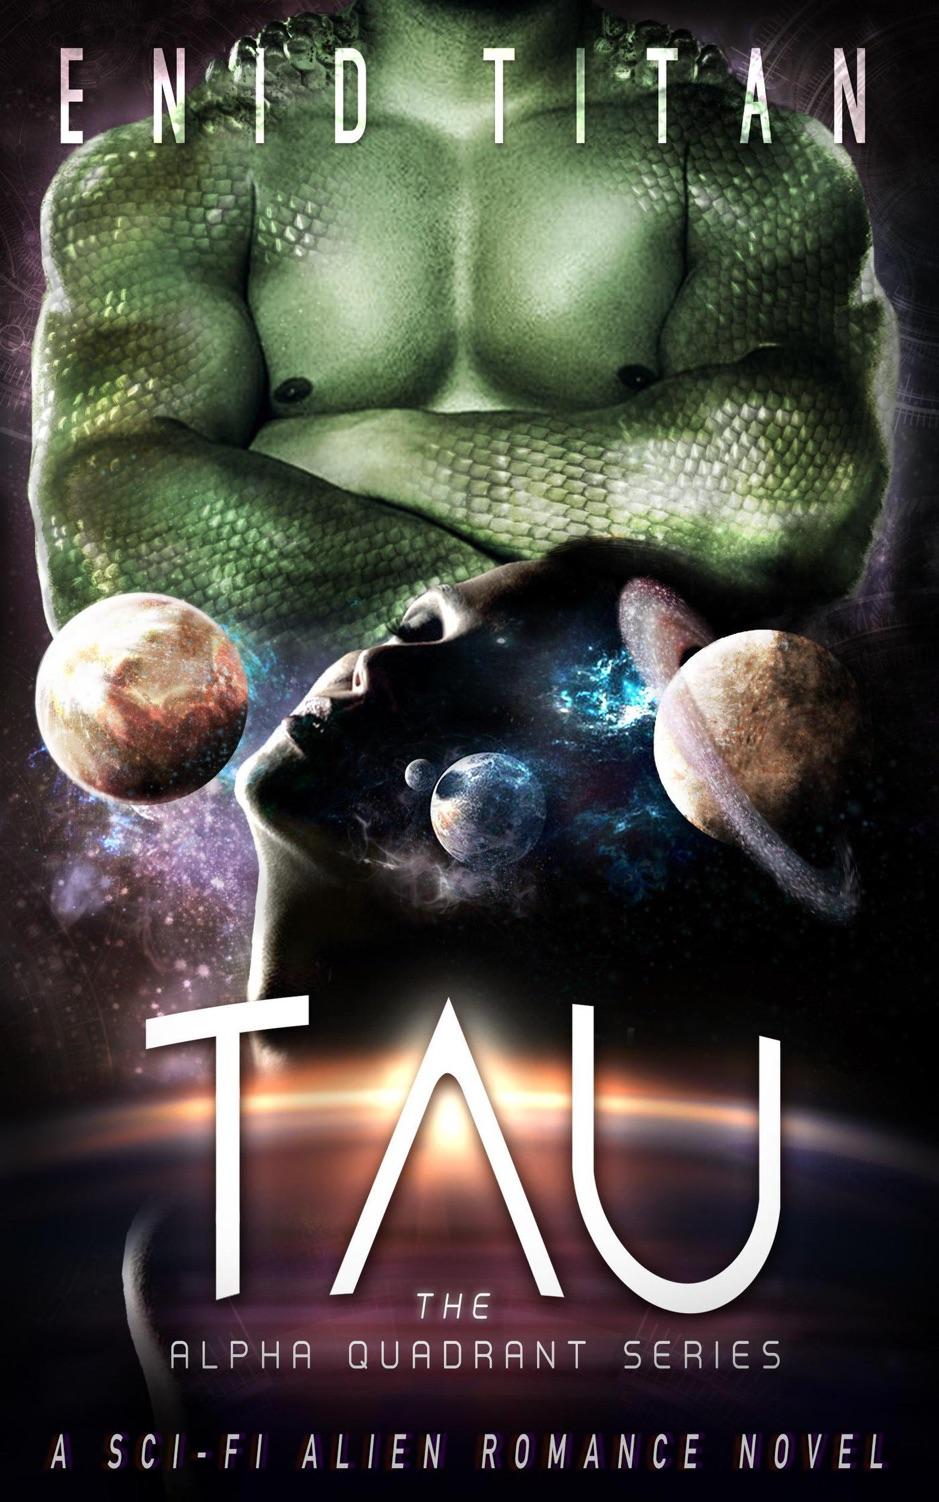 Tau: A Sci-Fi Alien Romance Novel